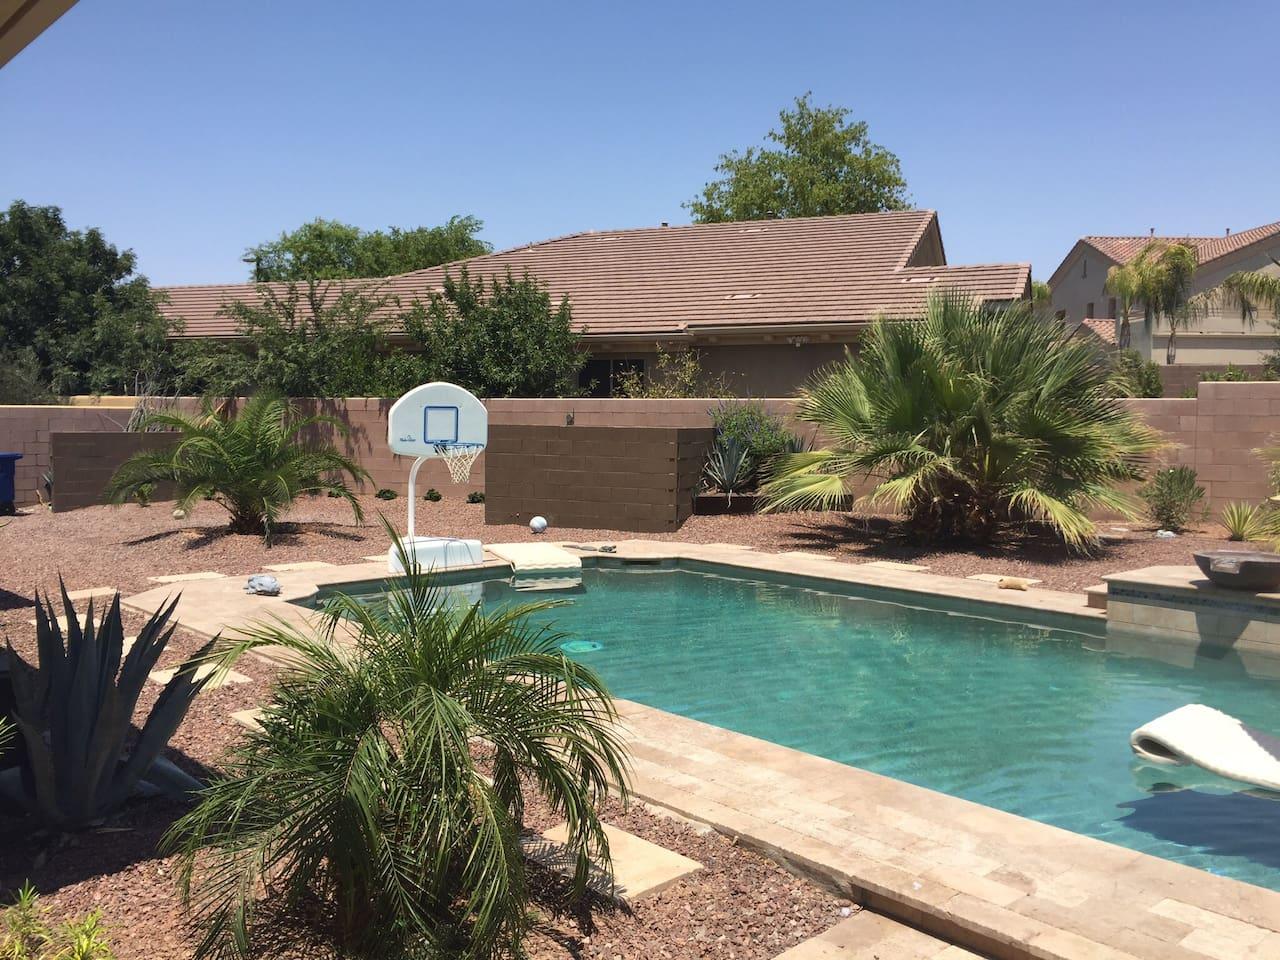 Pool - Left Side